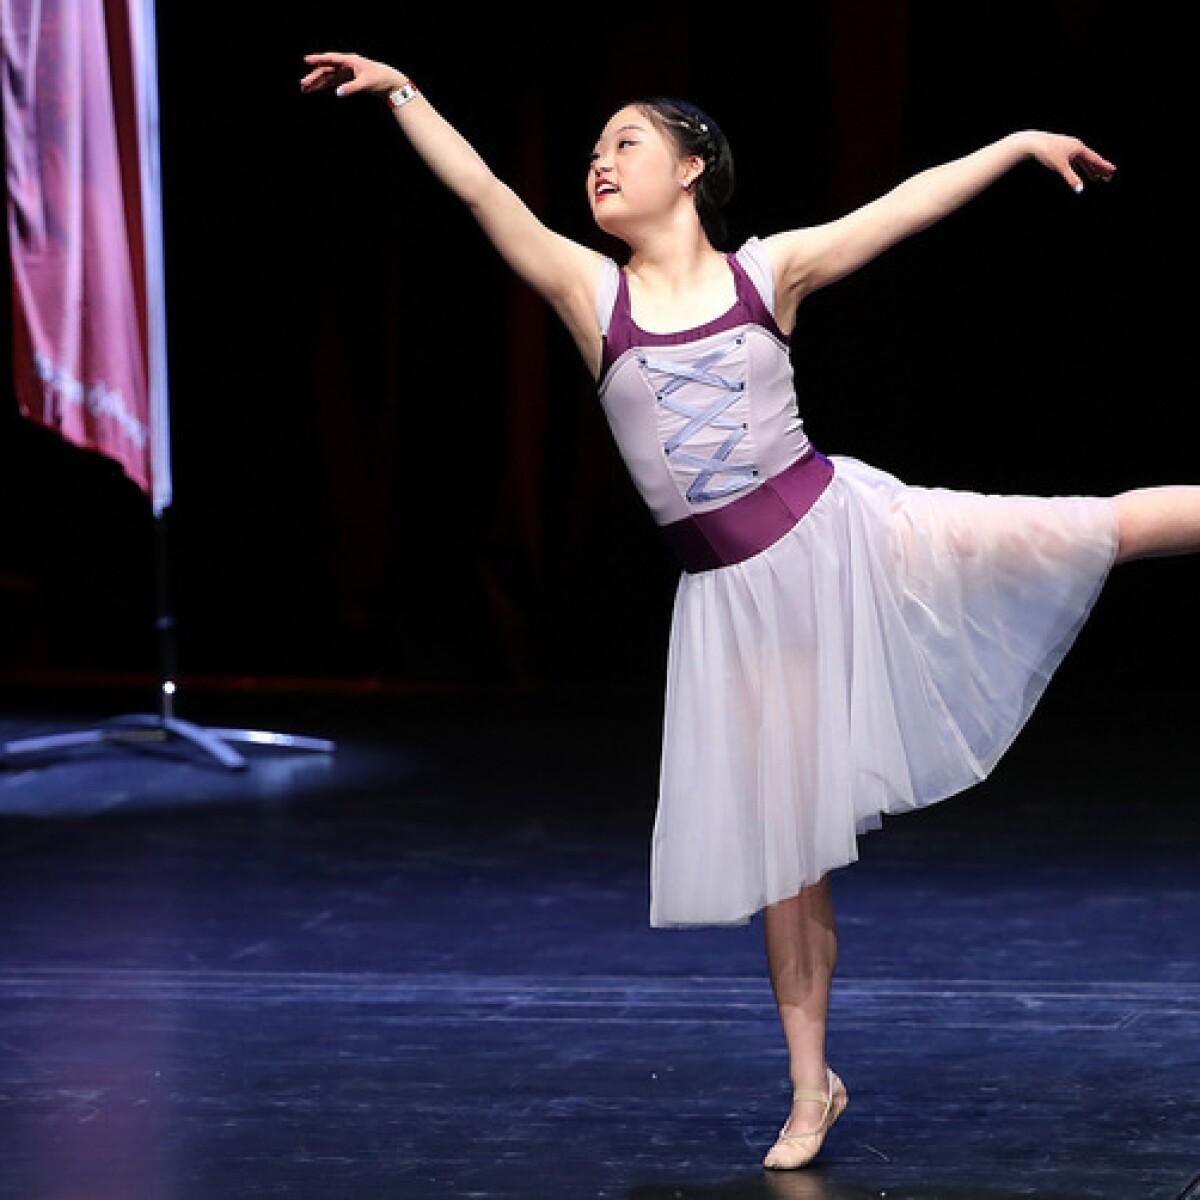 Special Olympics: Rhythmic Gymnastics |Special Olympics Dance